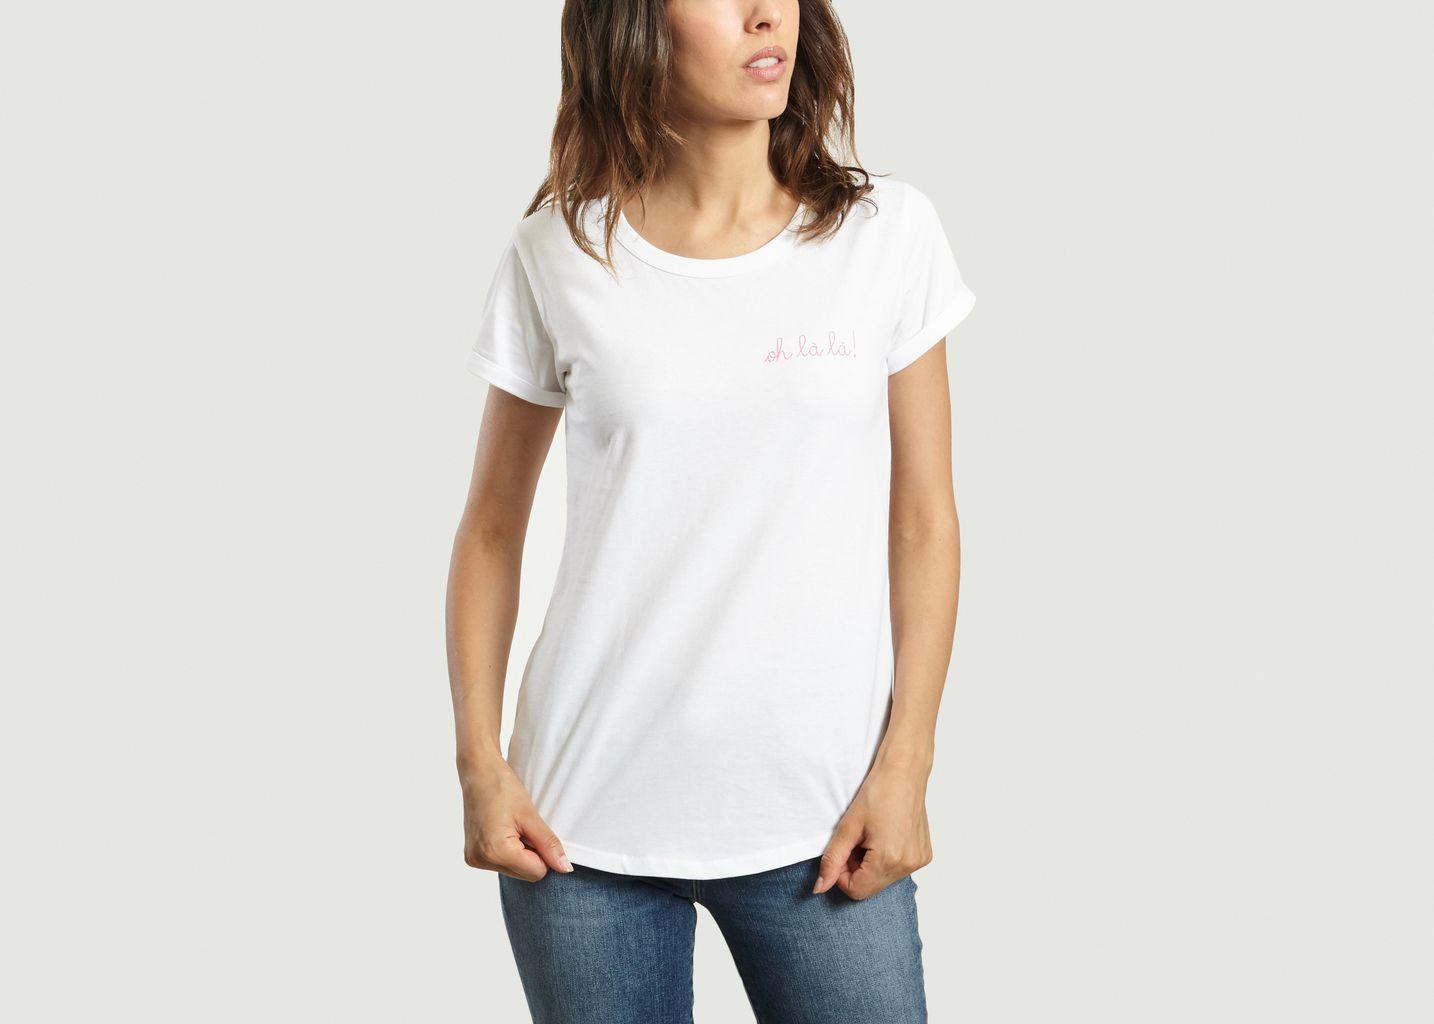 T-Shirt Oh là là ! - Maison Labiche